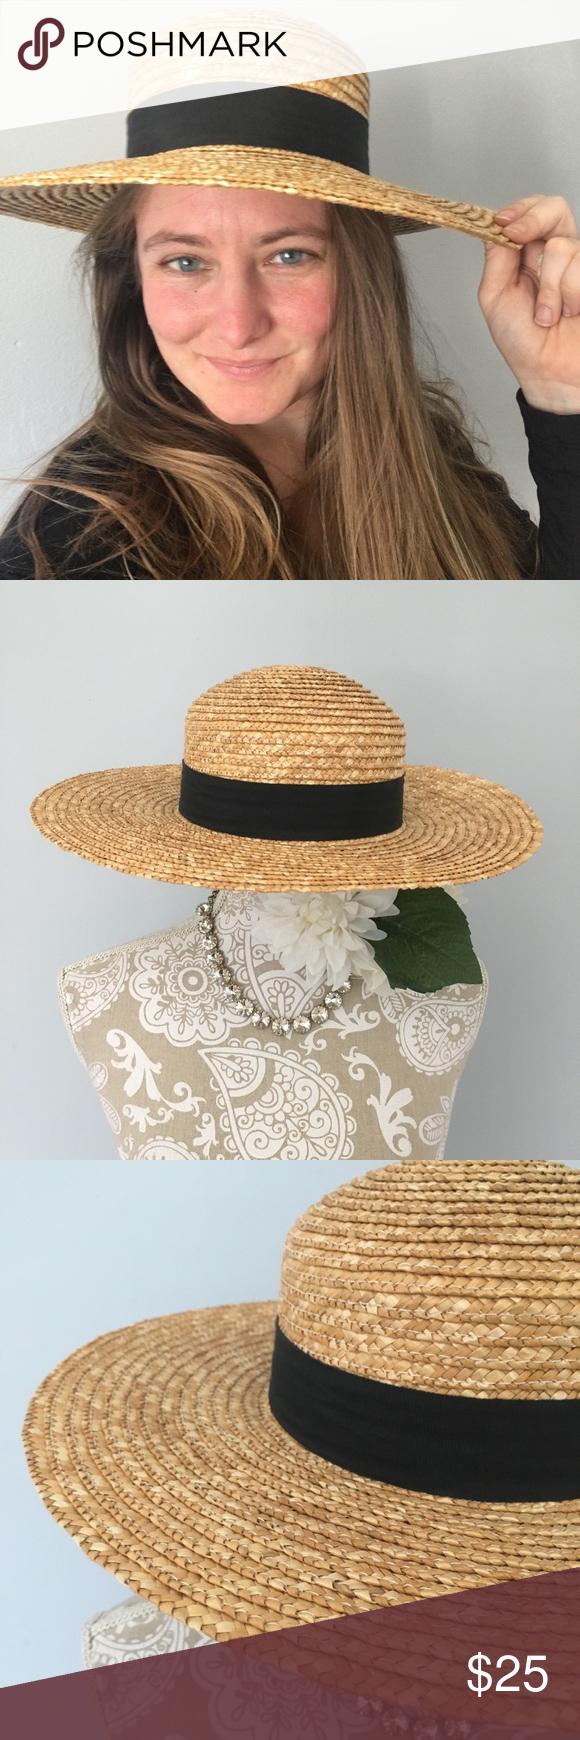 Round Straw Sun Hat With Black Bow Black Bow Large Brim Hat Sun Hats